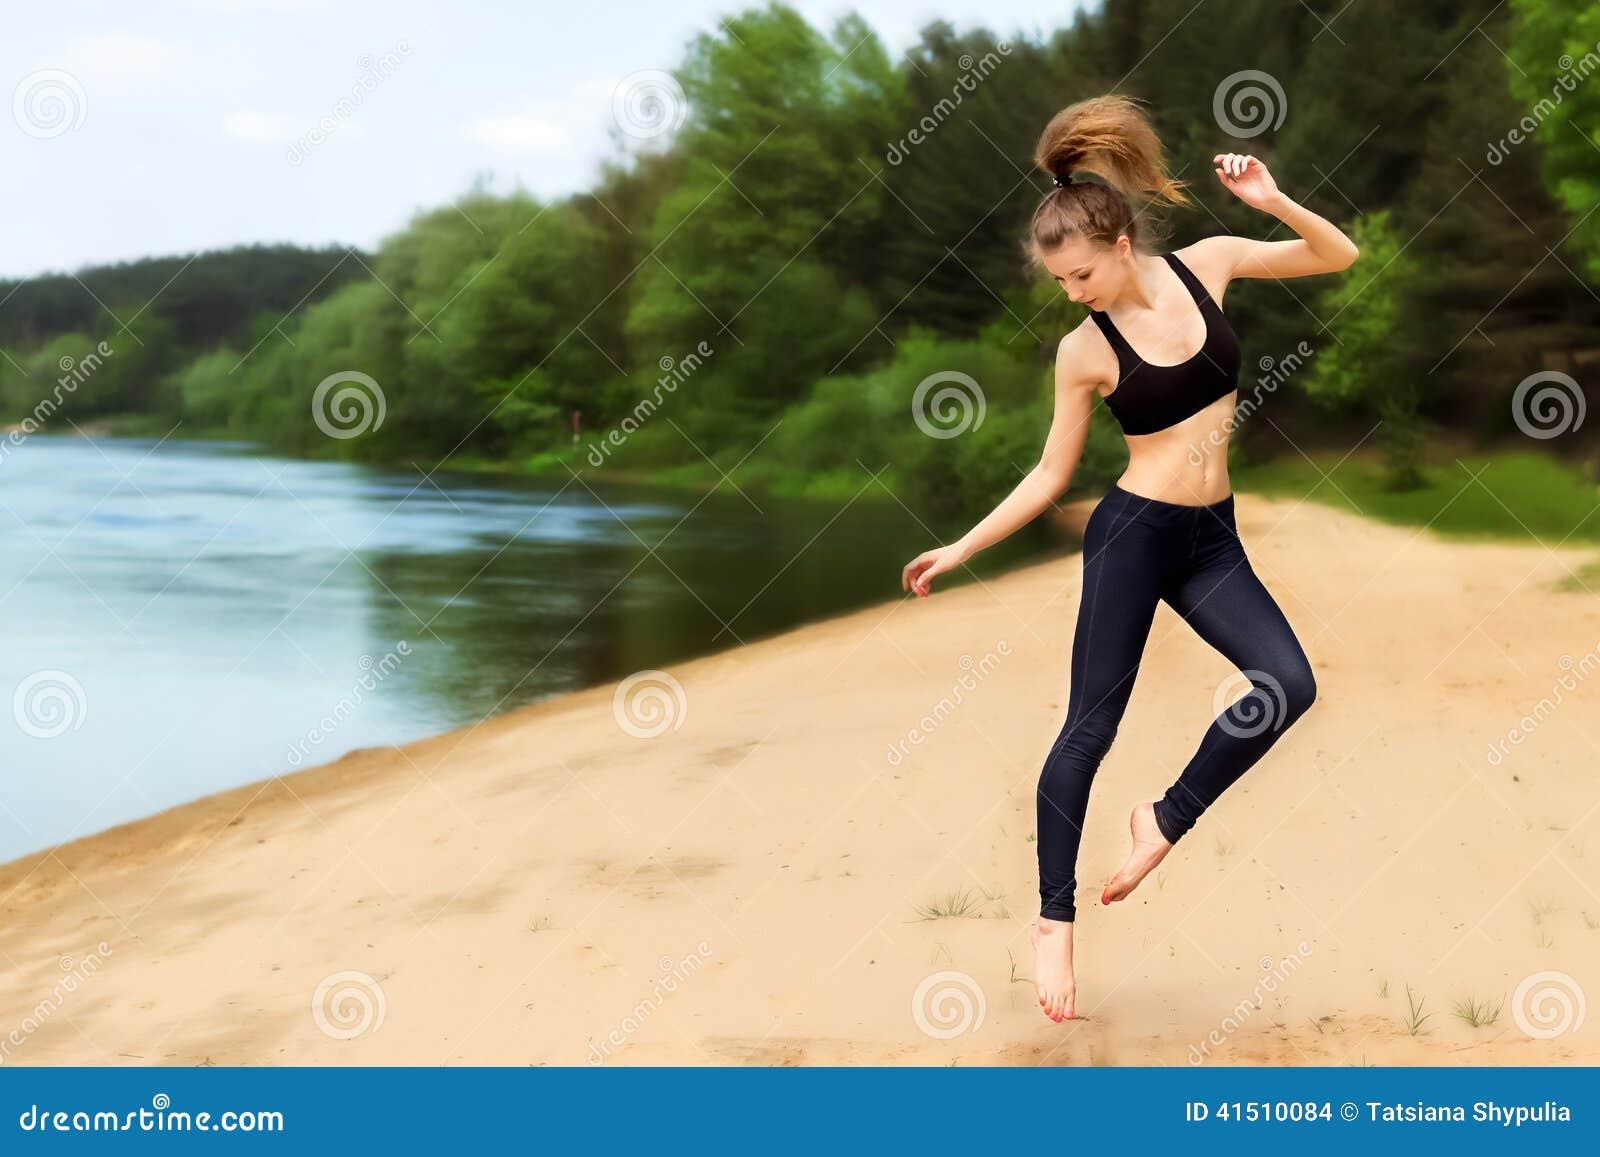 Фото девушки фитнес на пляже 3 фотография